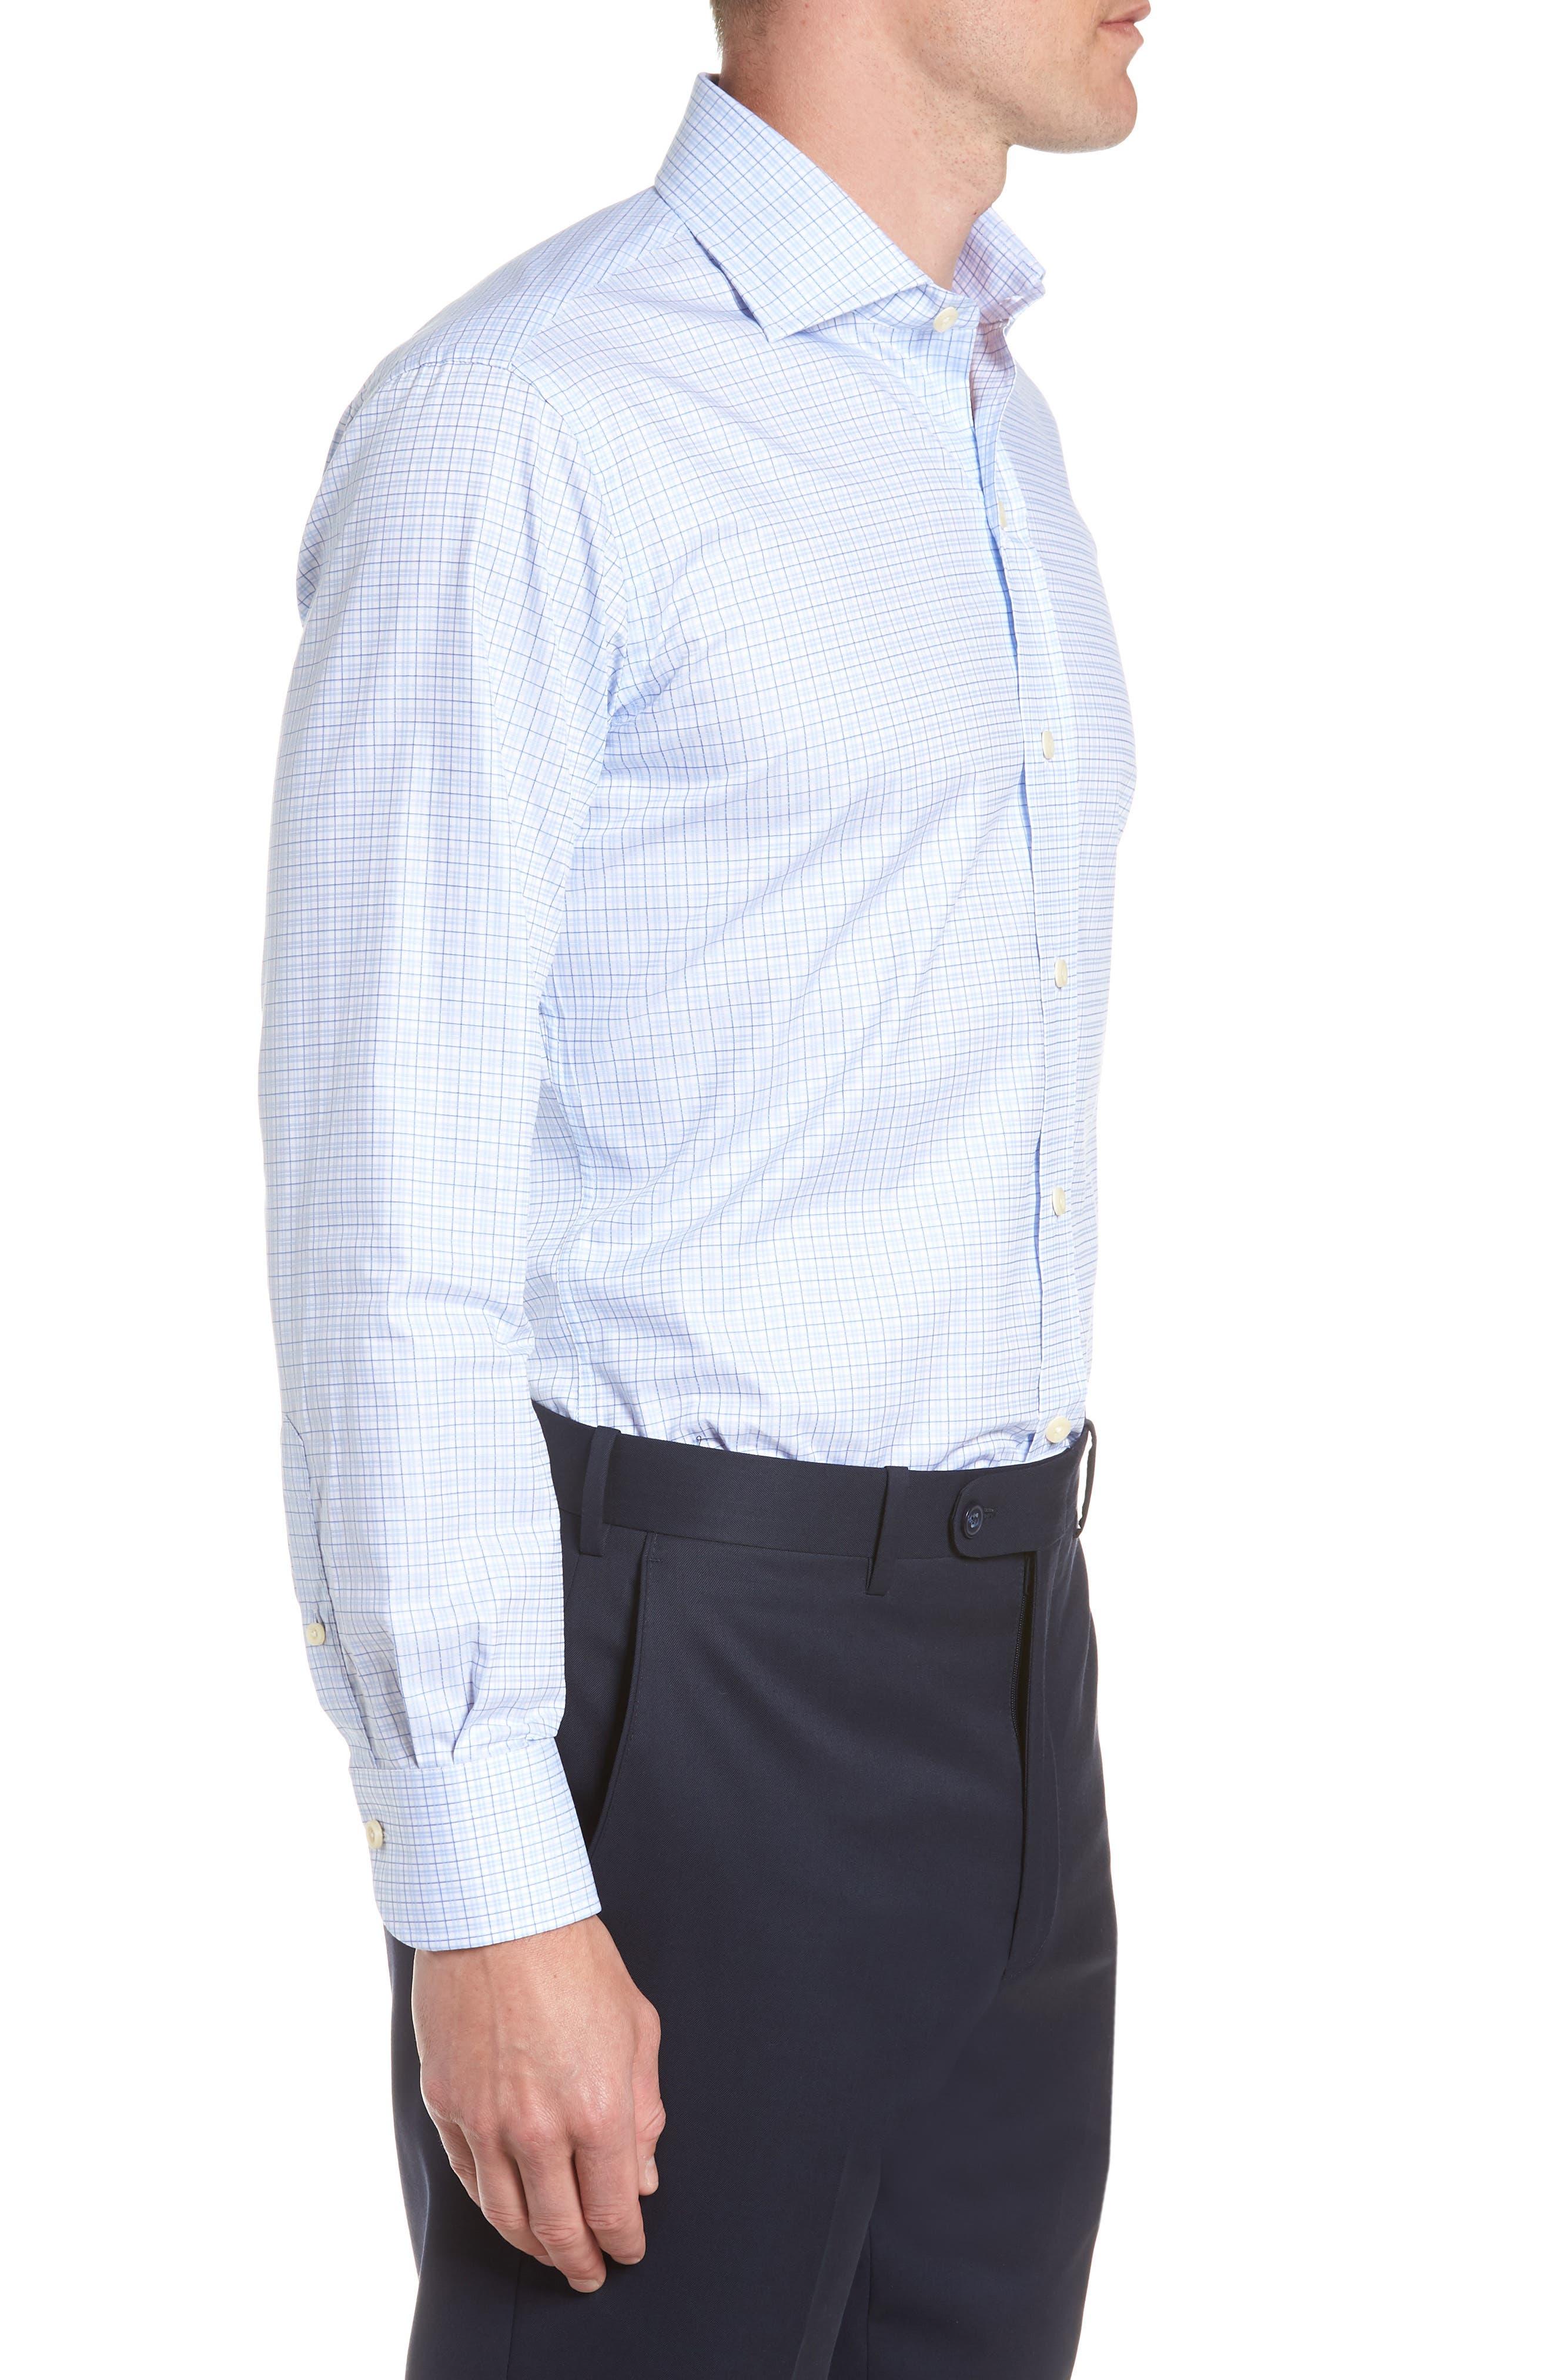 Moorland Trim Fit Check Dress Shirt,                             Alternate thumbnail 4, color,                             Blue